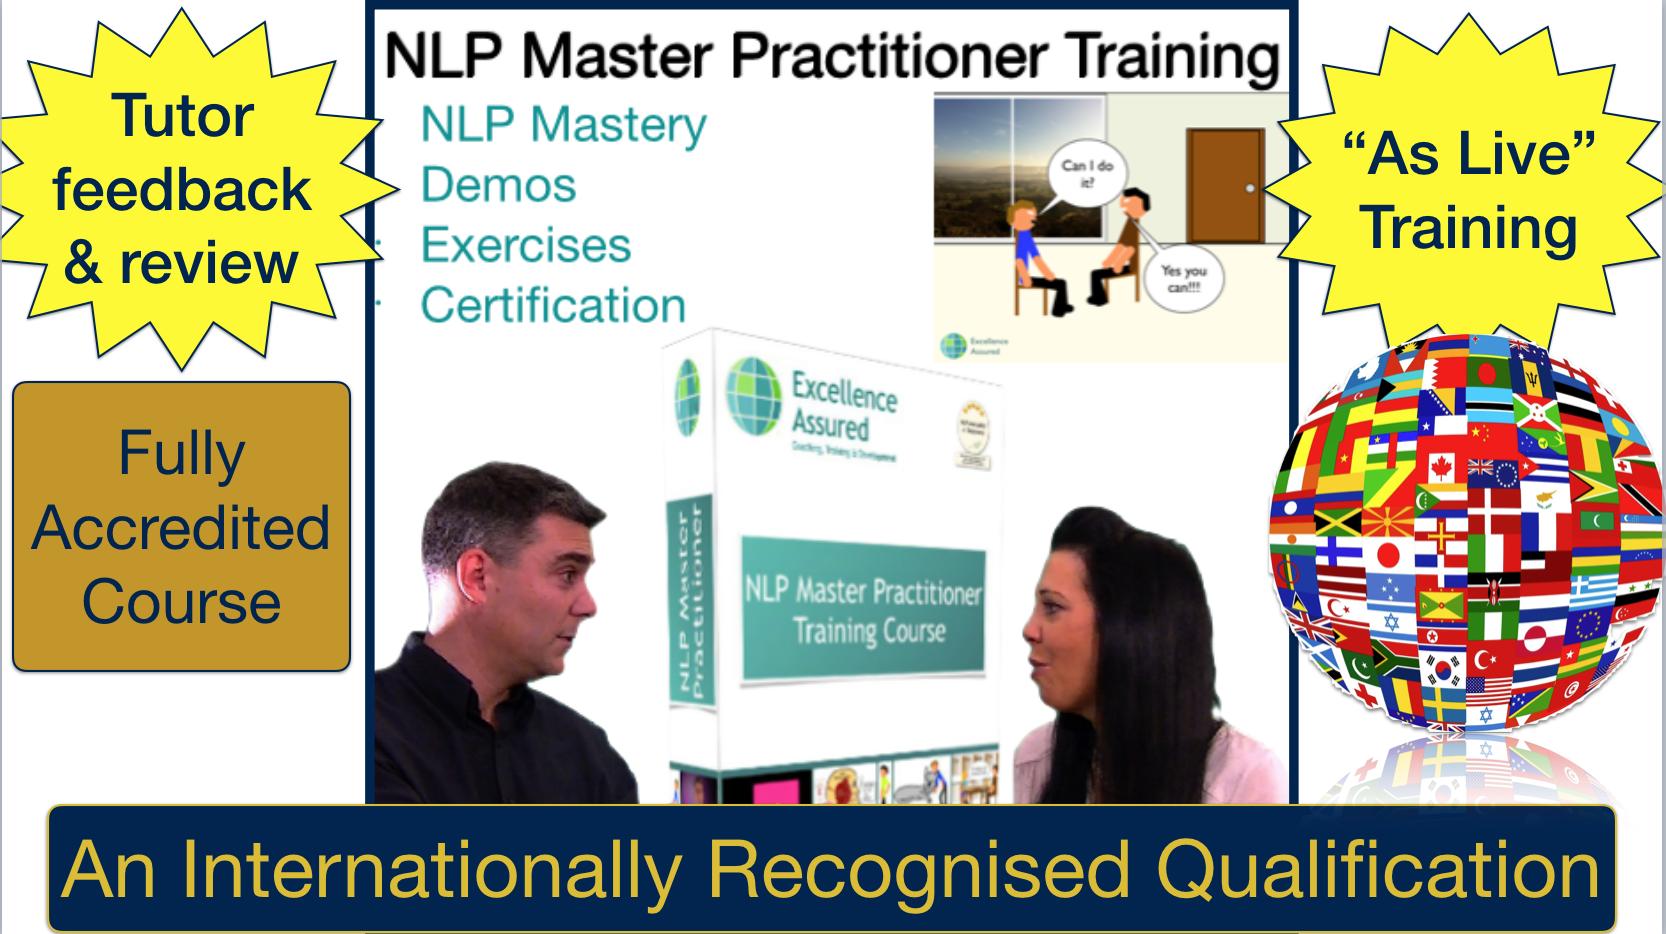 NLP Master Practitioner Training Course - Online plus